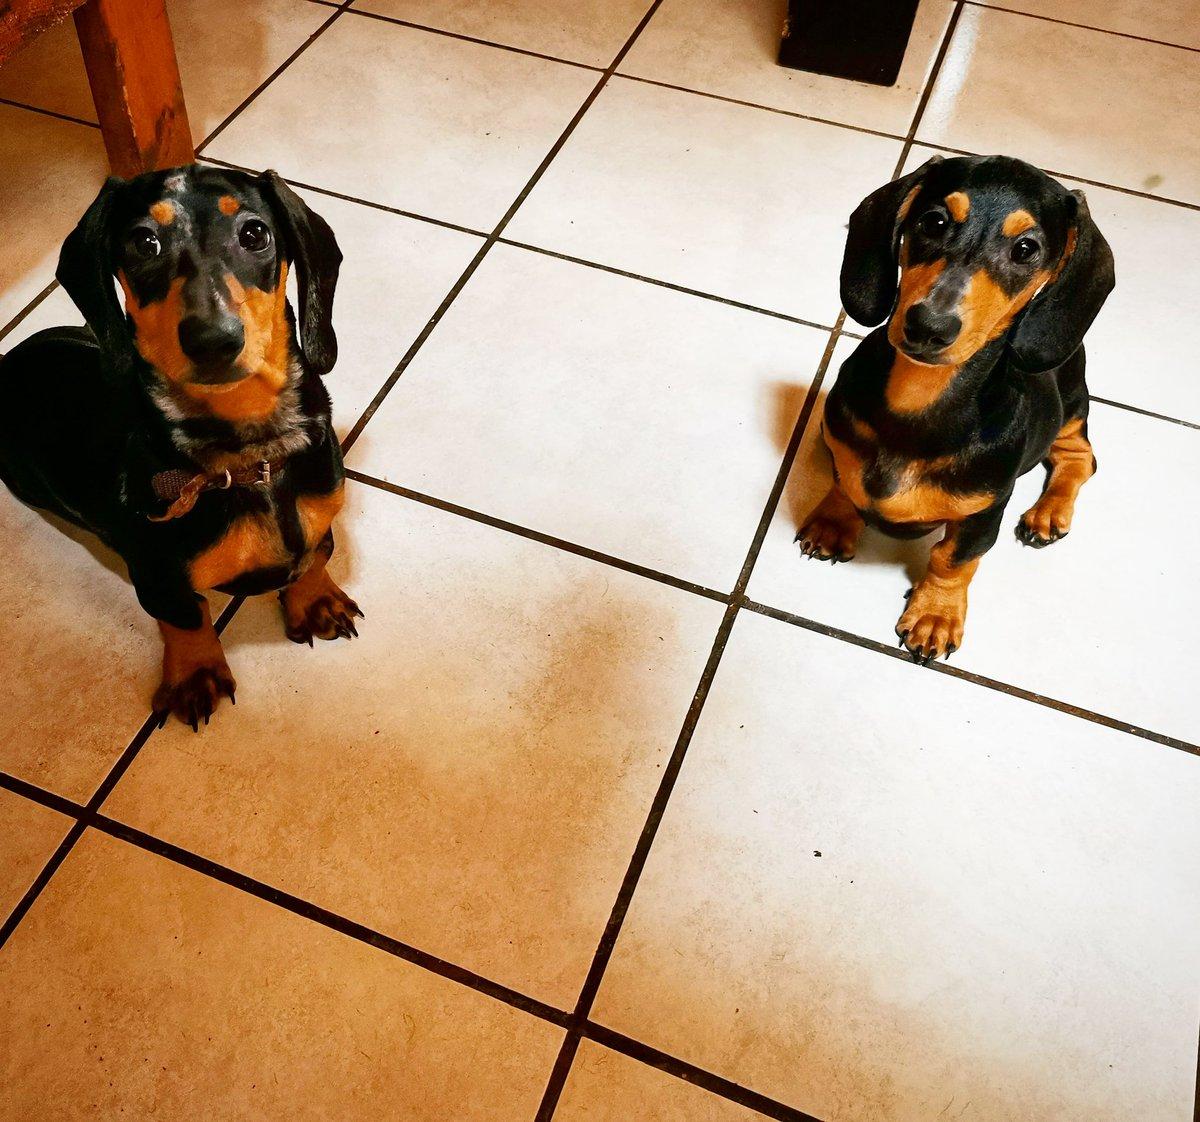 #dachshundpuppies 🐶🐶❤️ https://t.co/3ROQ86gKCu